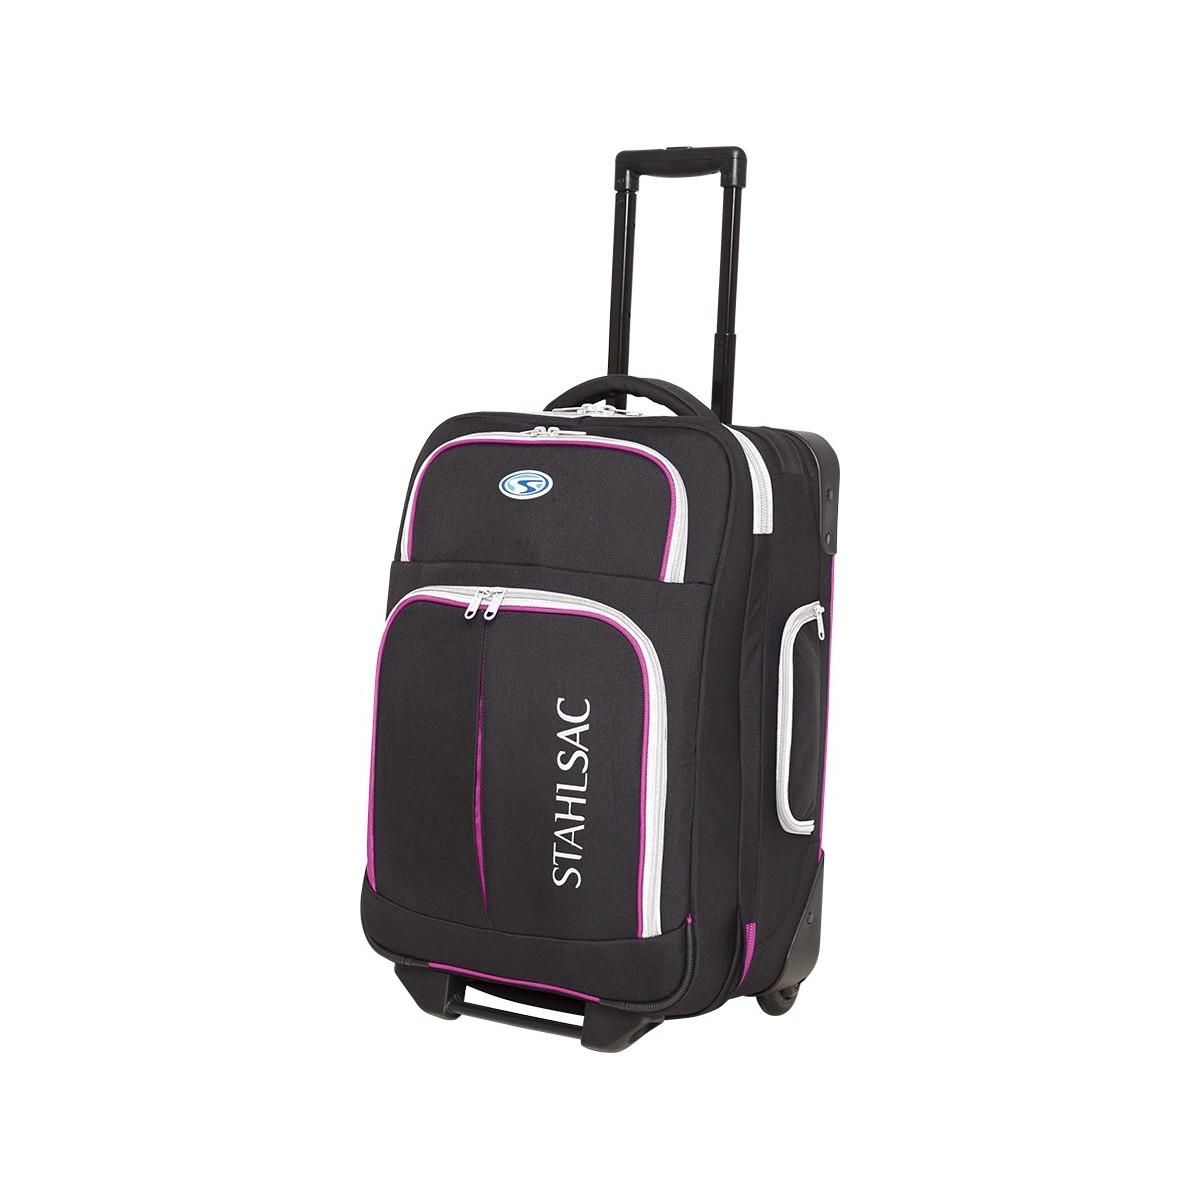 Stahlsac Rangi Roller Travel Bag